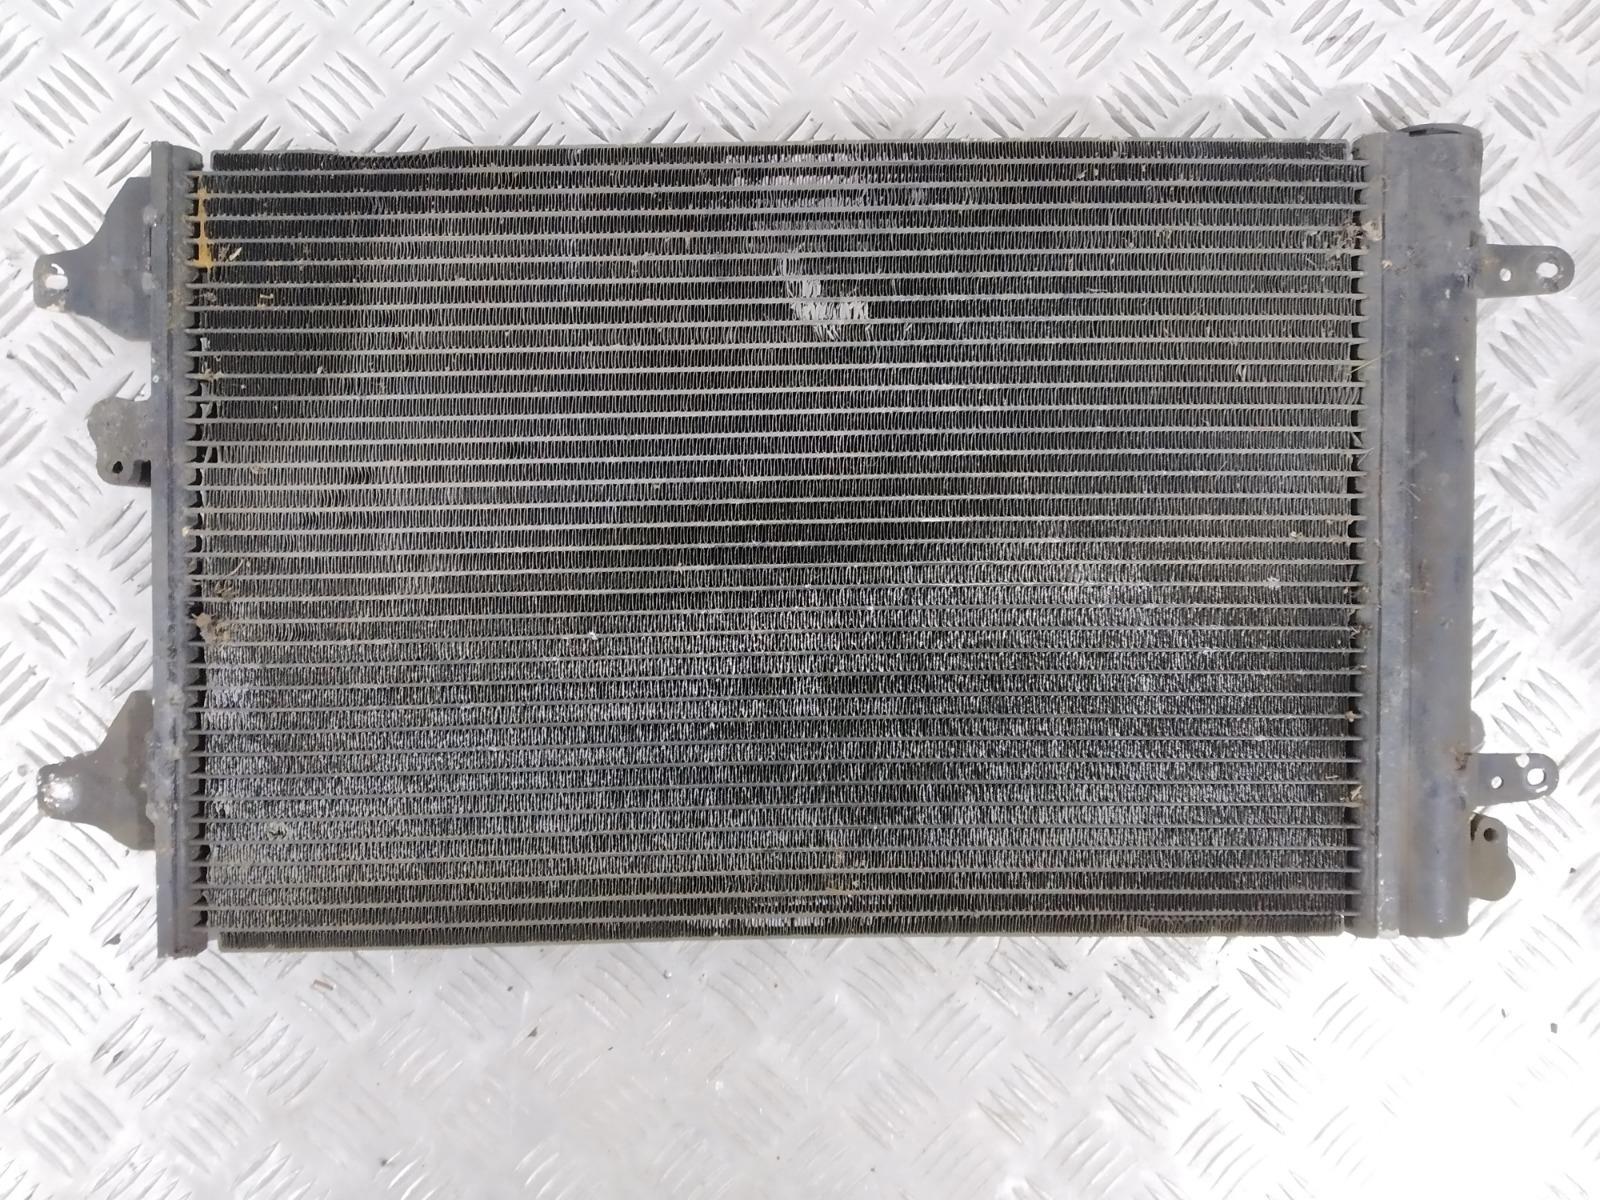 Радиатор кондиционера Ford Galaxy 1.9 TDI 2001 (б/у)